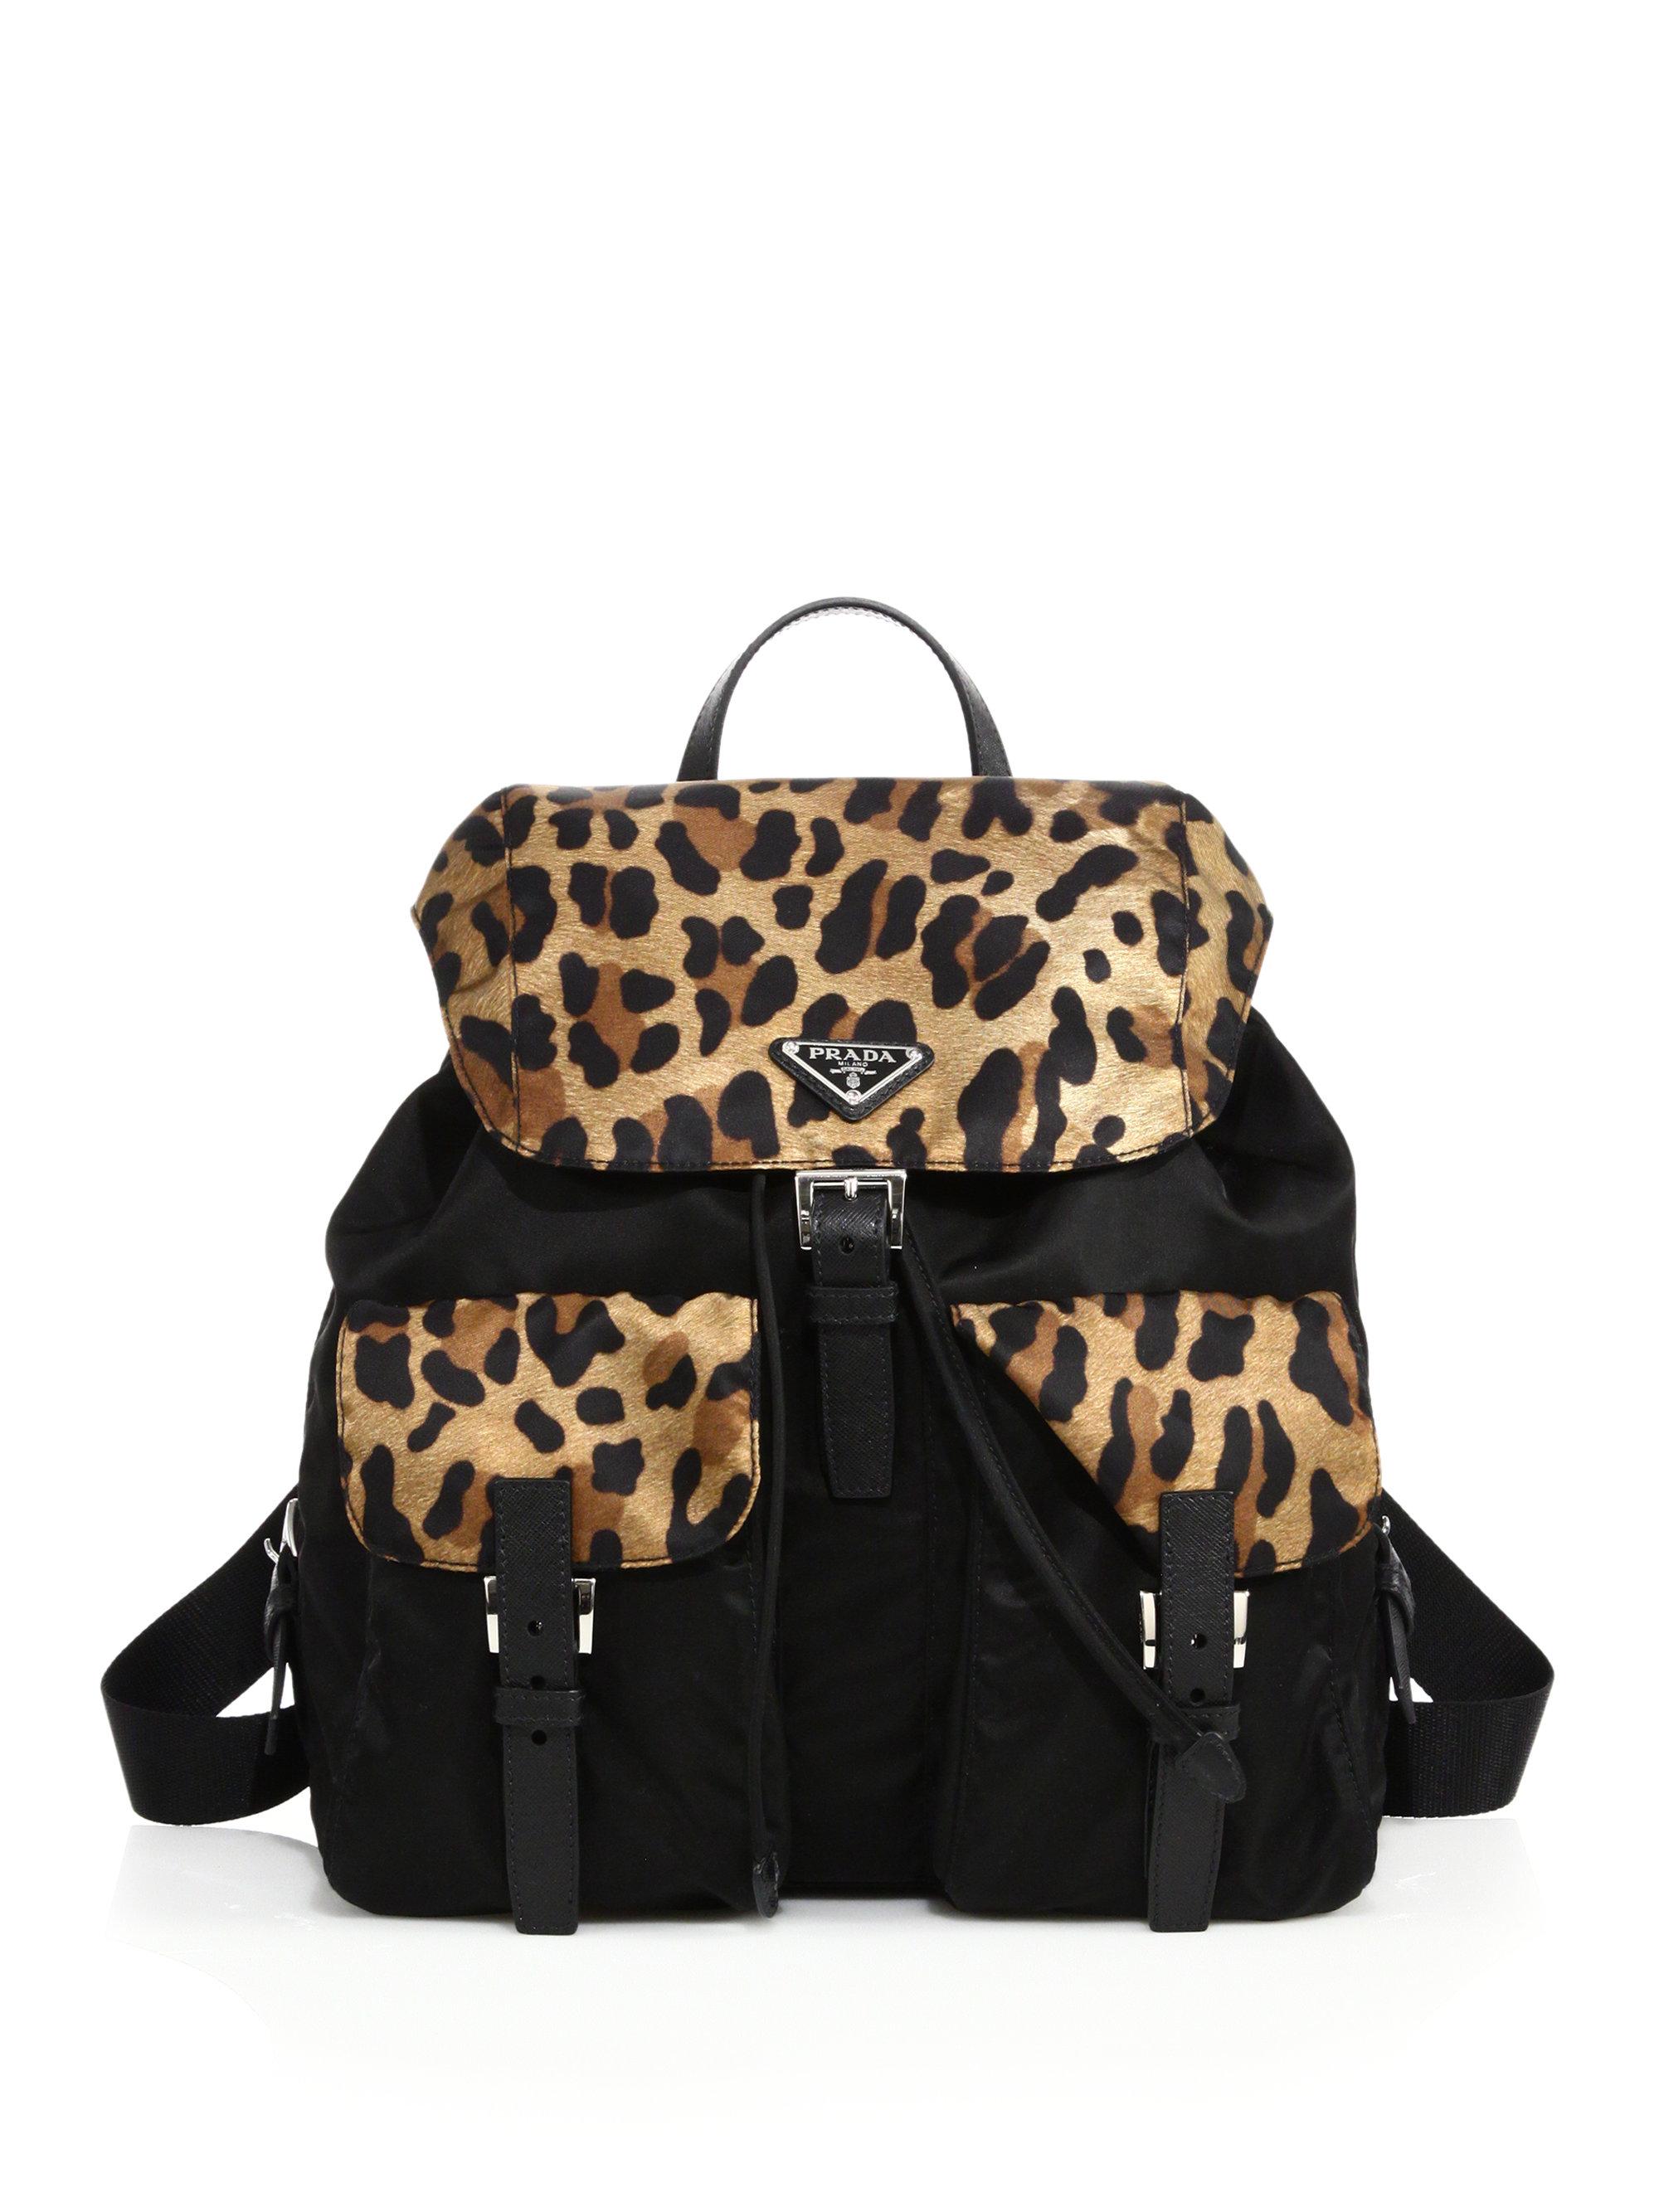 Prada Backpack Bag